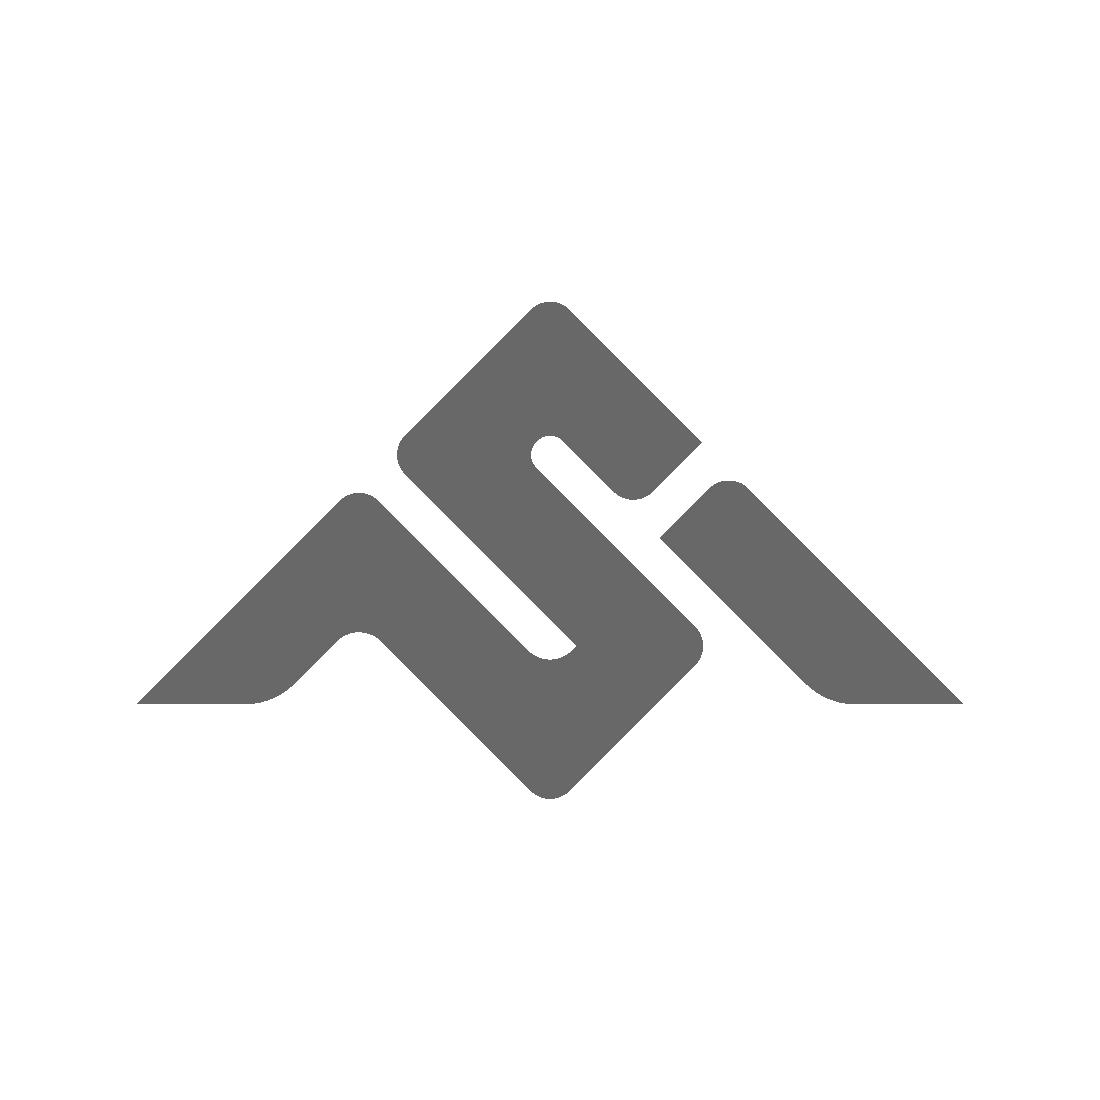 Seba Ice Skate Frame Transform Your Skates In Pair Of